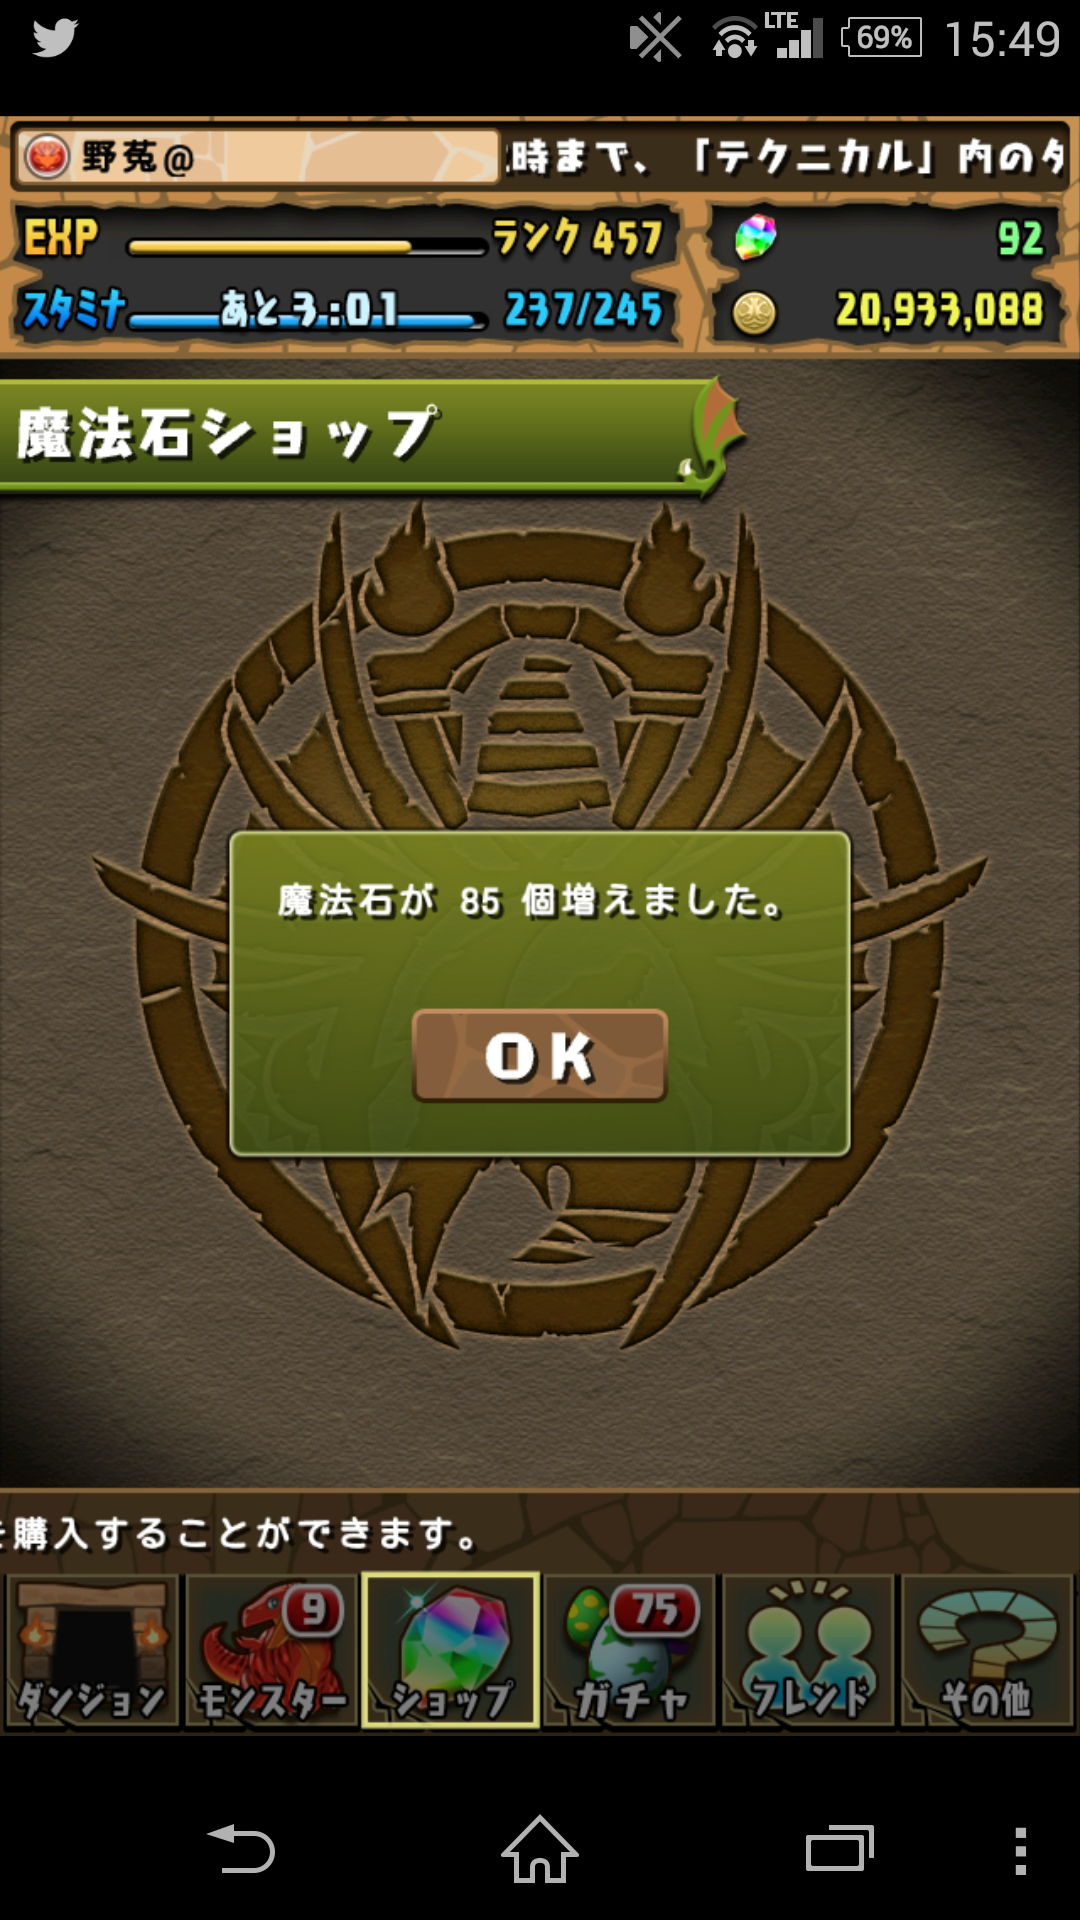 Screenshot_2015-02-01-15-50-00.png